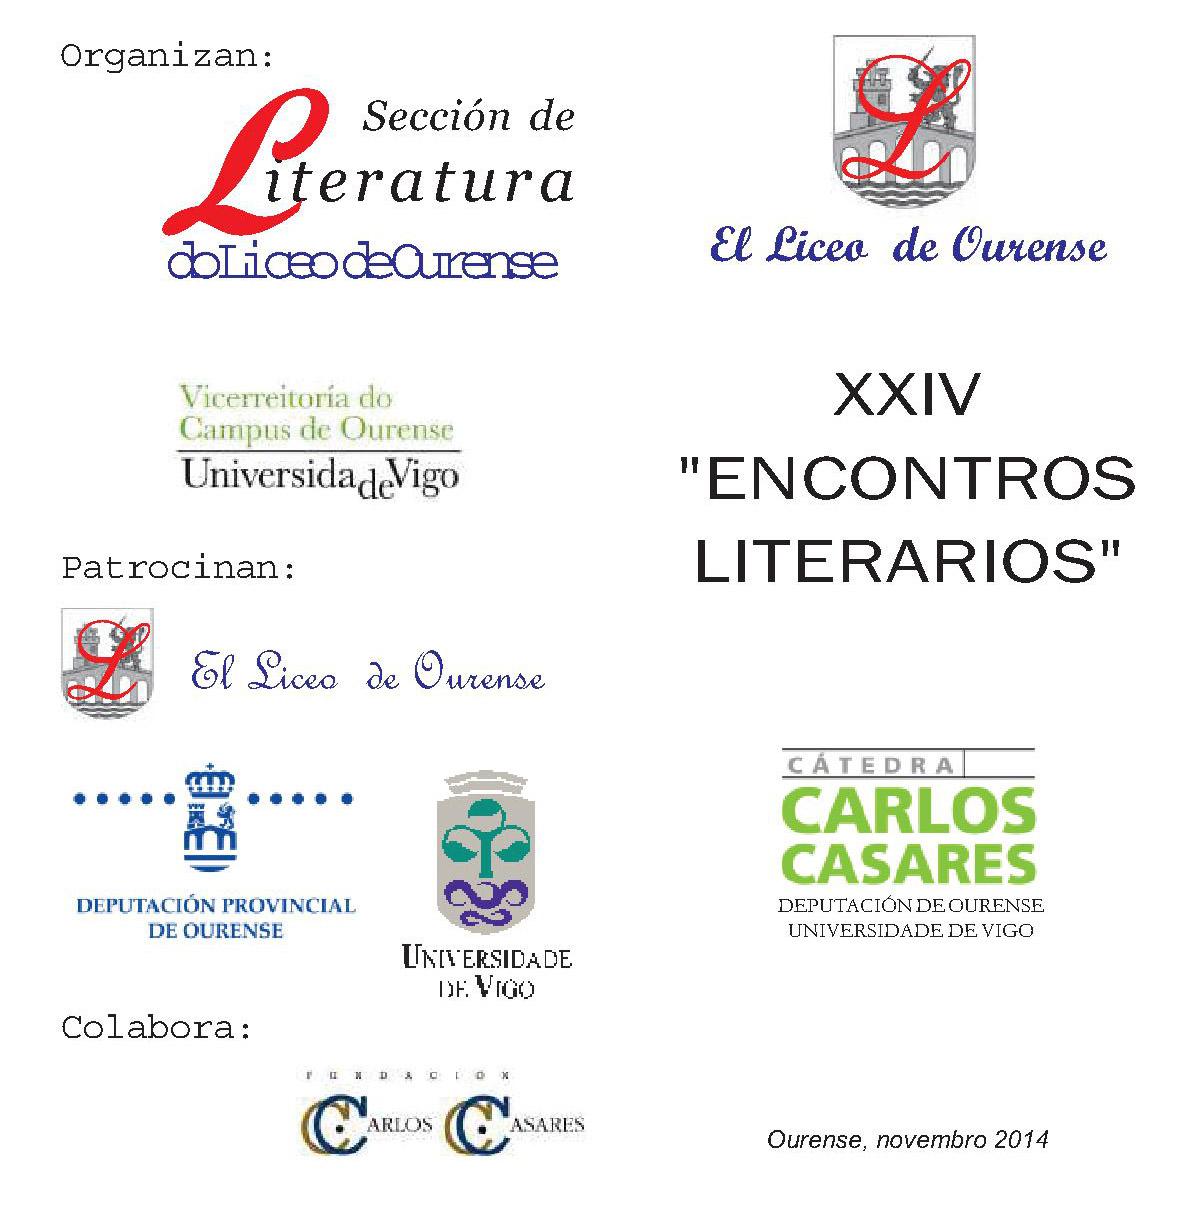 http://www.liceodeourense.com/2.0/wp-content/uploads/ENCONTROS-LITERARIOS.jpg